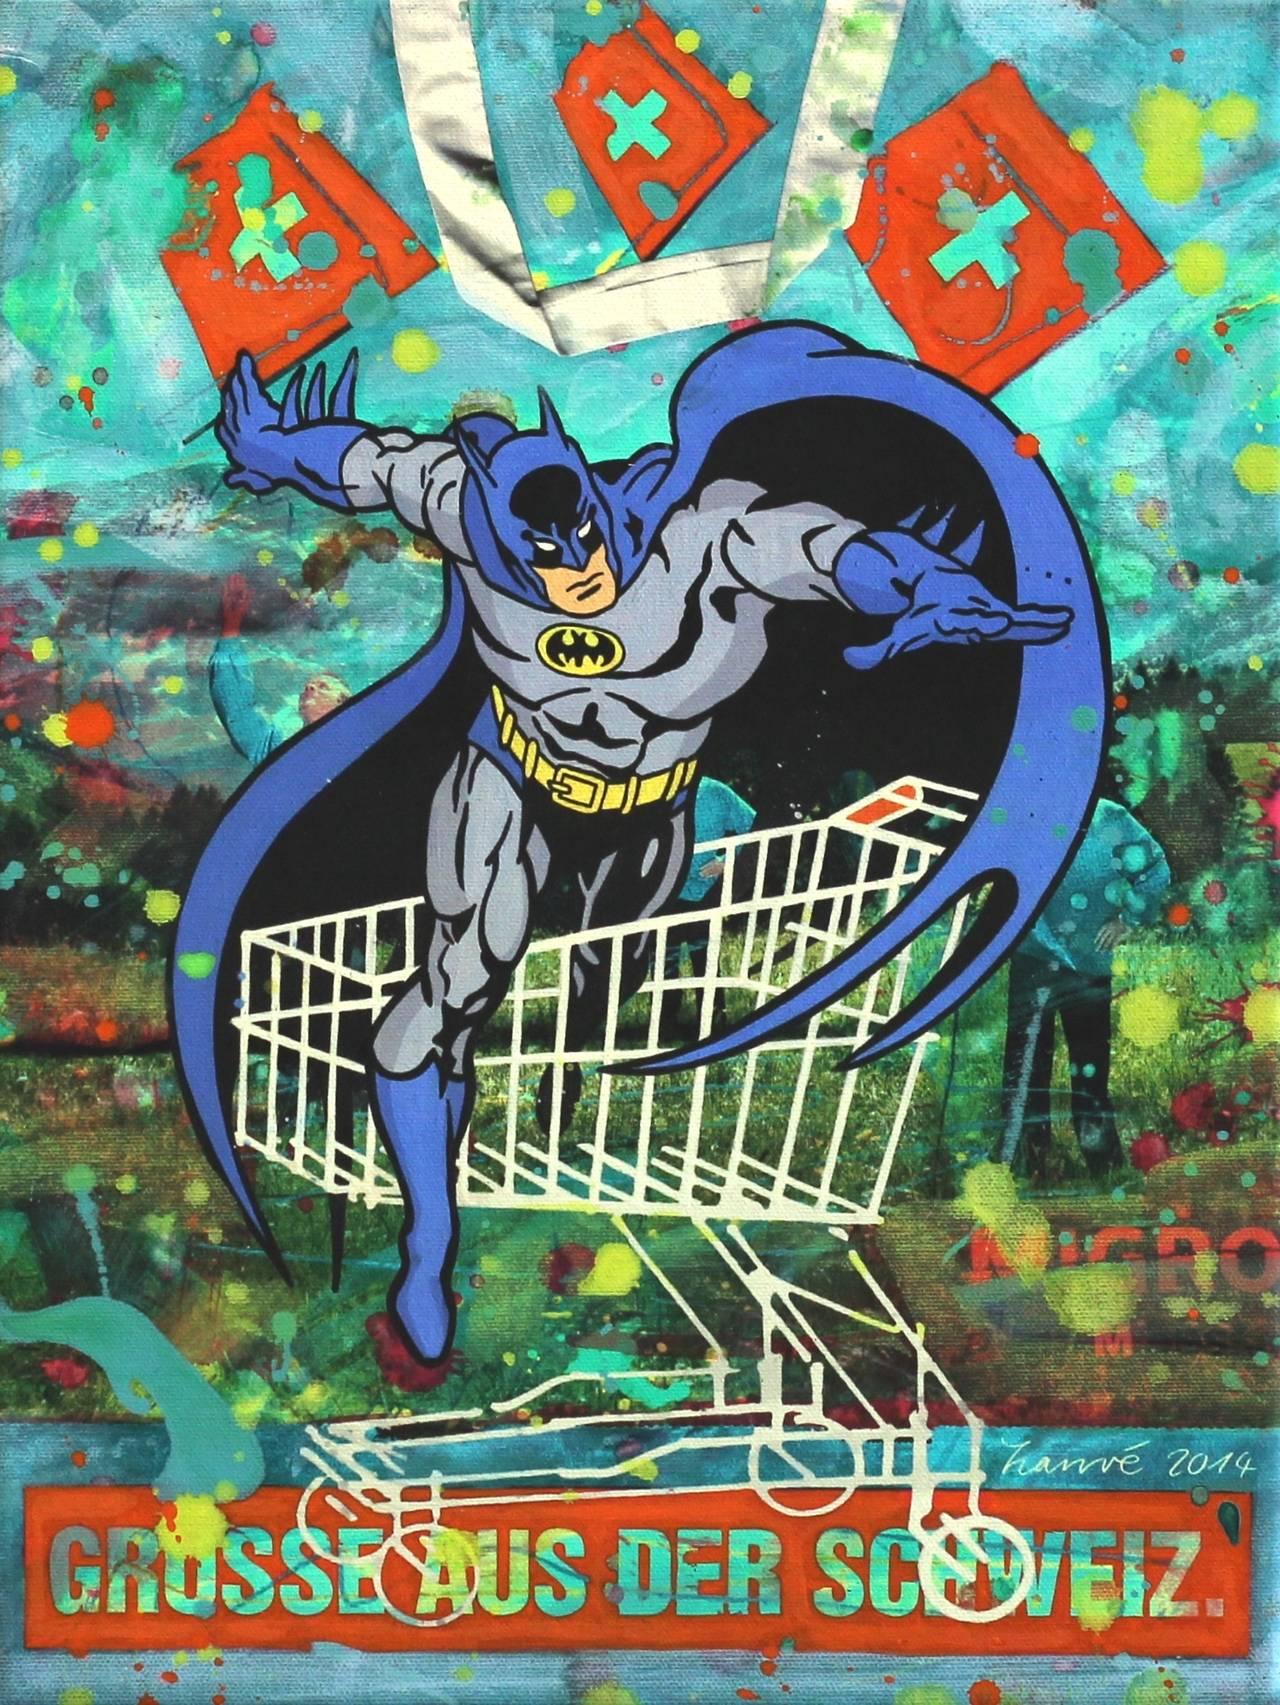 Zanre batman greetings from switzerland painting for sale at zanr figurative painting batman greetings from switzerland m4hsunfo